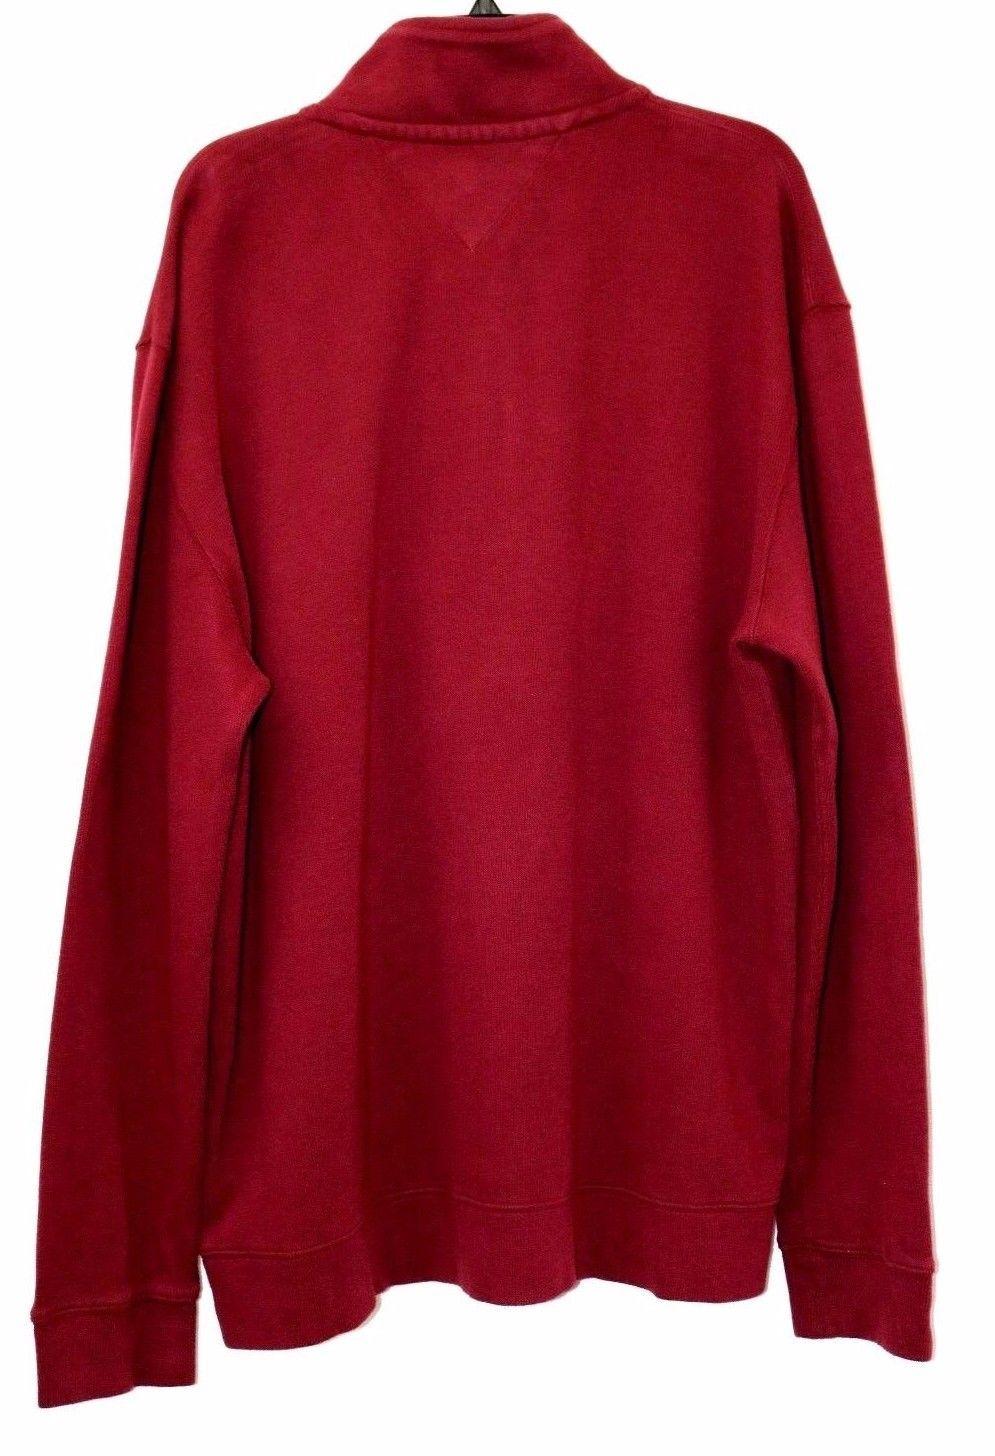 Tommy Hilfiger Quarter Zip Mock Collar Sweater Dark Green Zinfandel Size S XXL